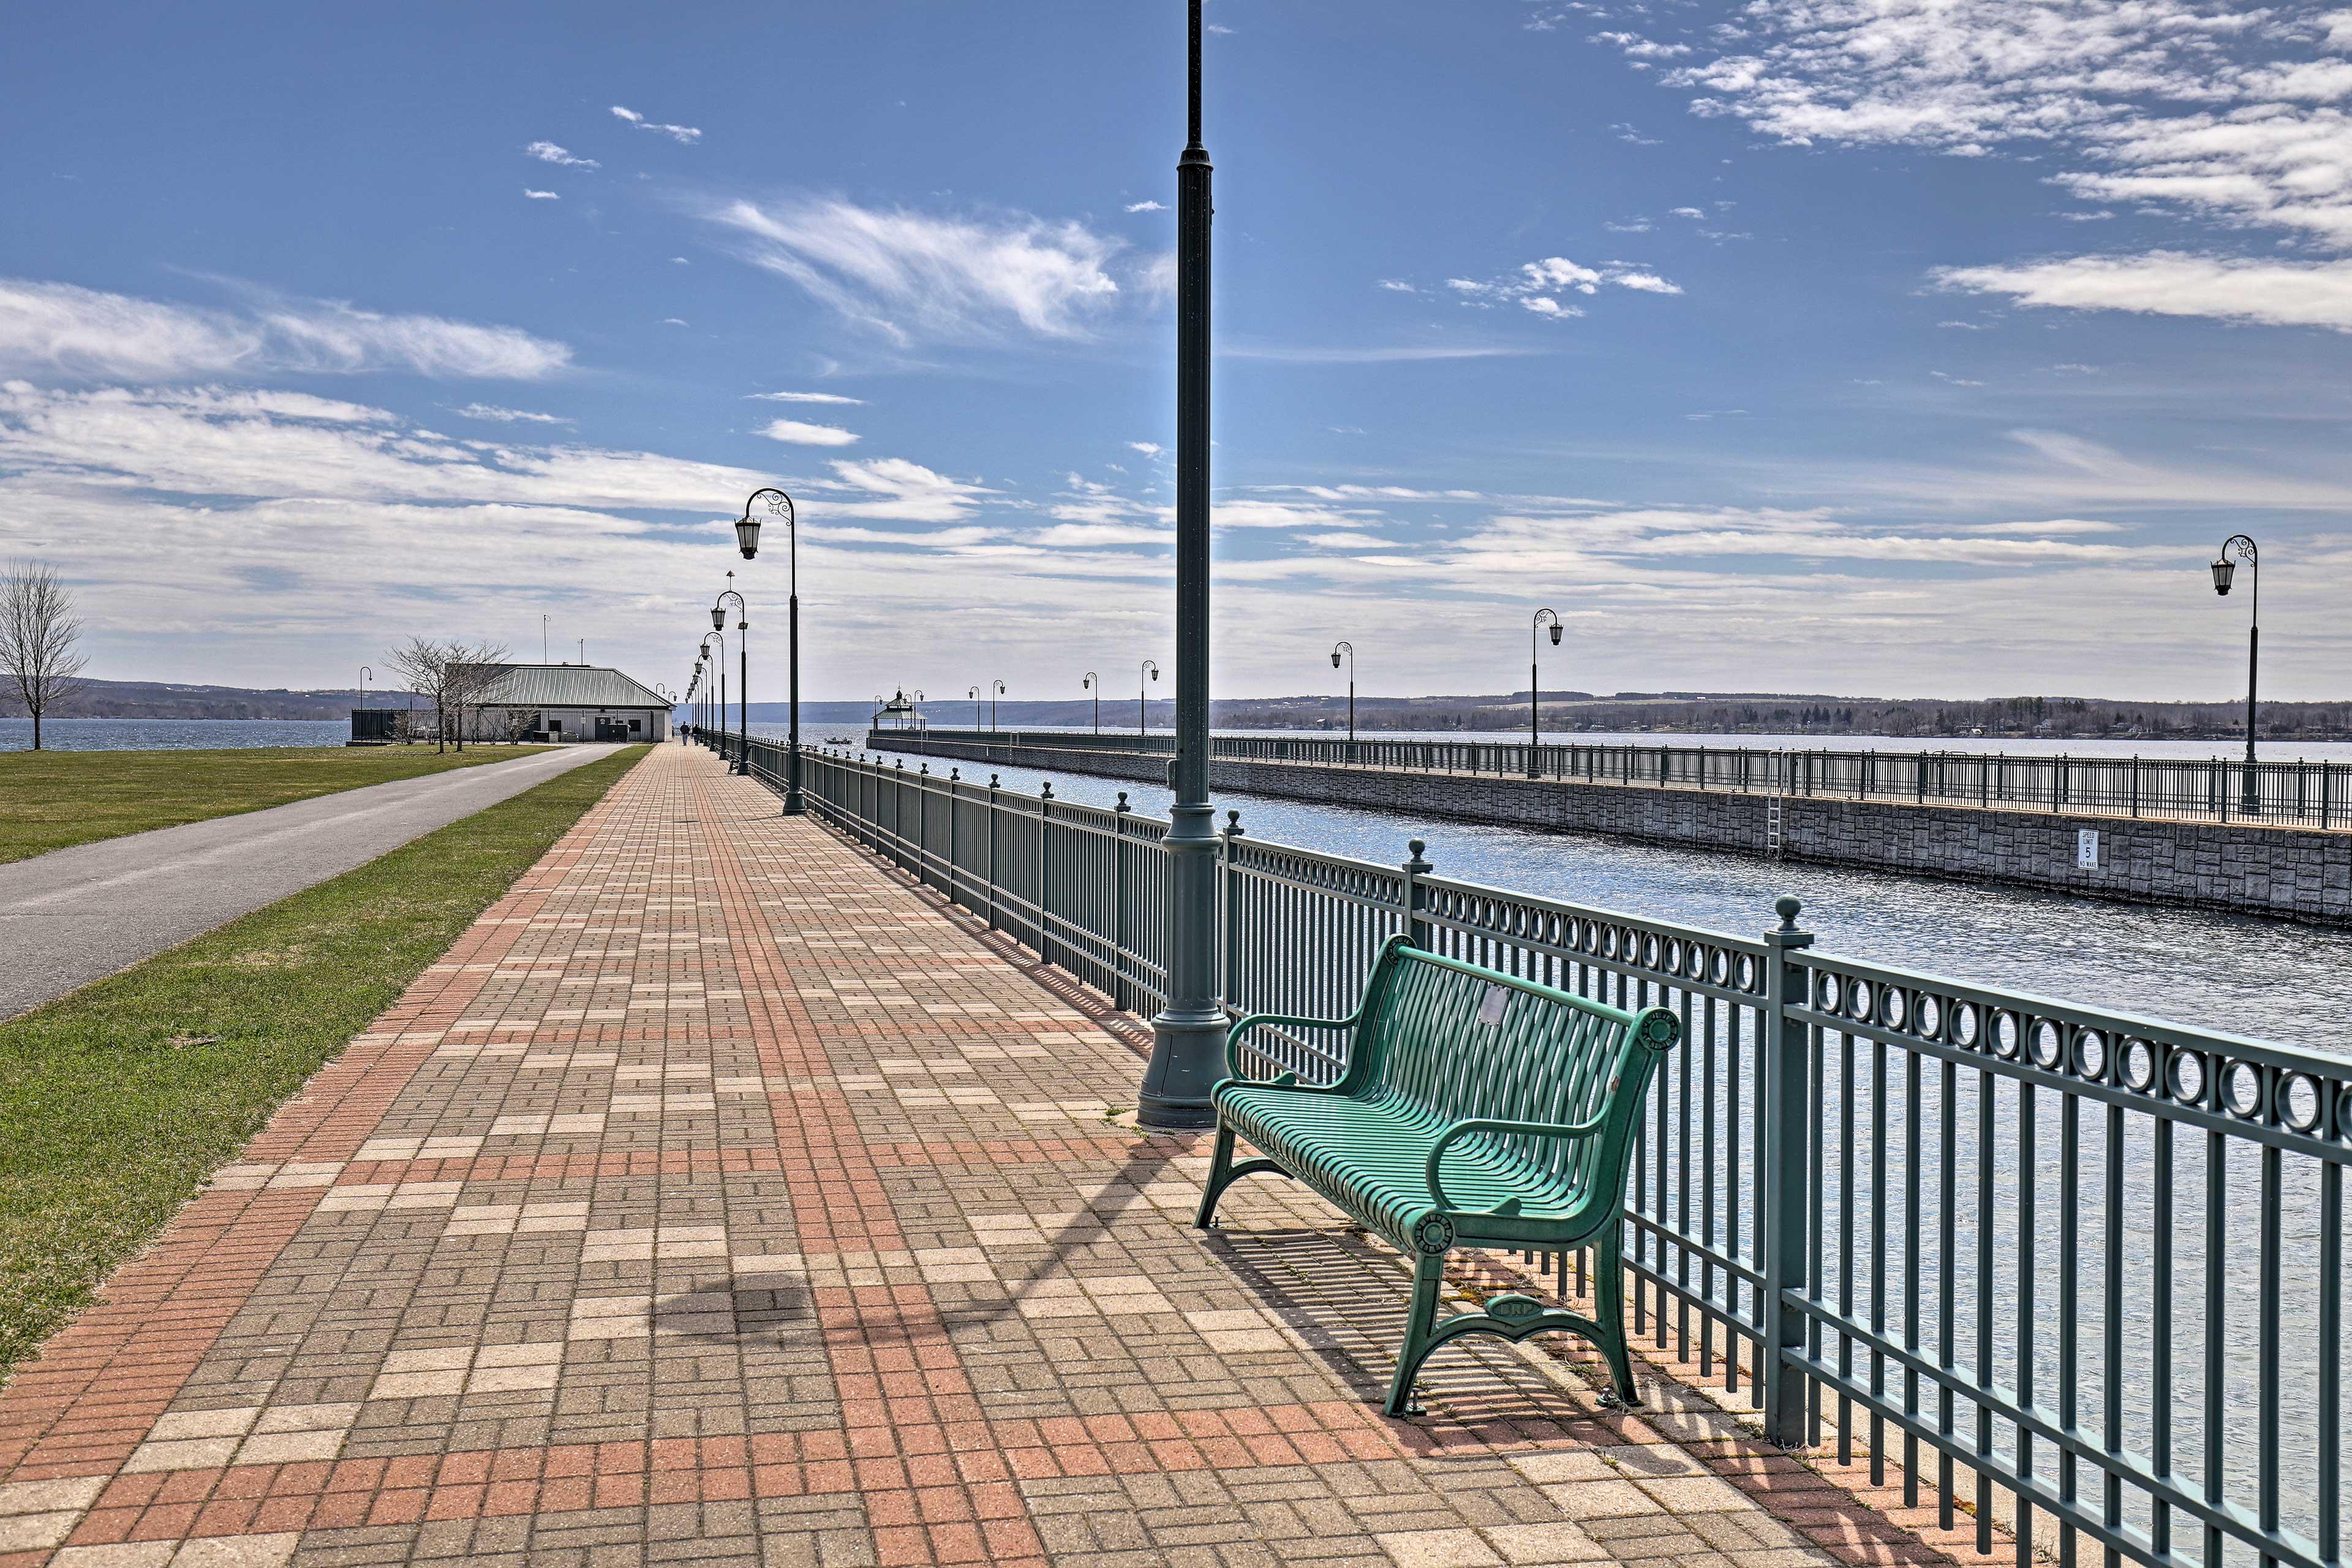 Stroll along the pier or dine at fantastic lakeside restaurants.